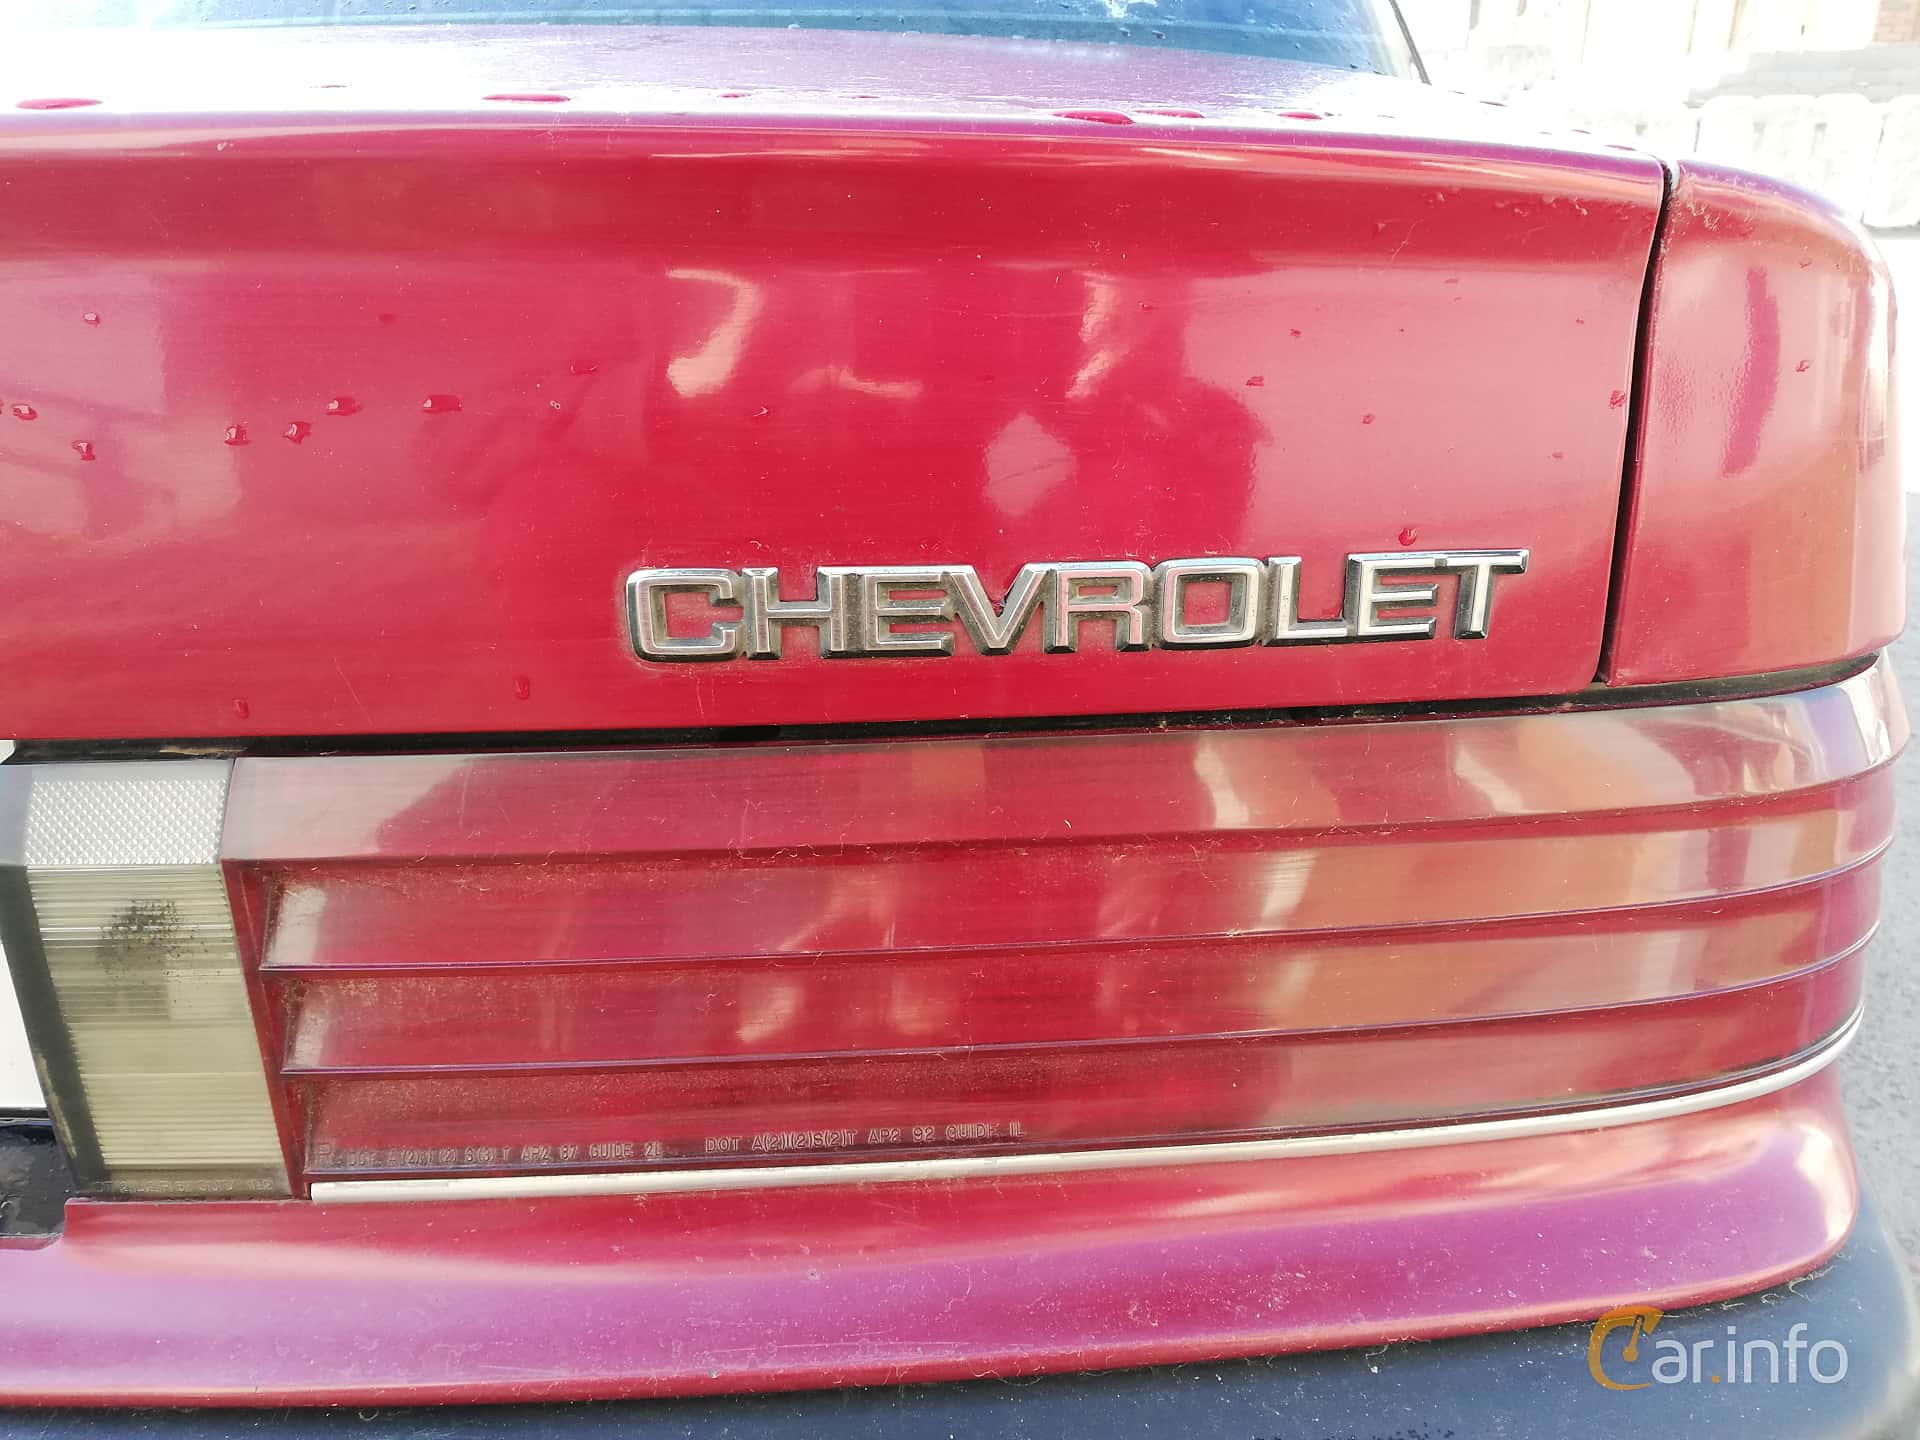 Chevrolet Corsica Sedan 3.1 V6 Automatic, 142hp, 1993